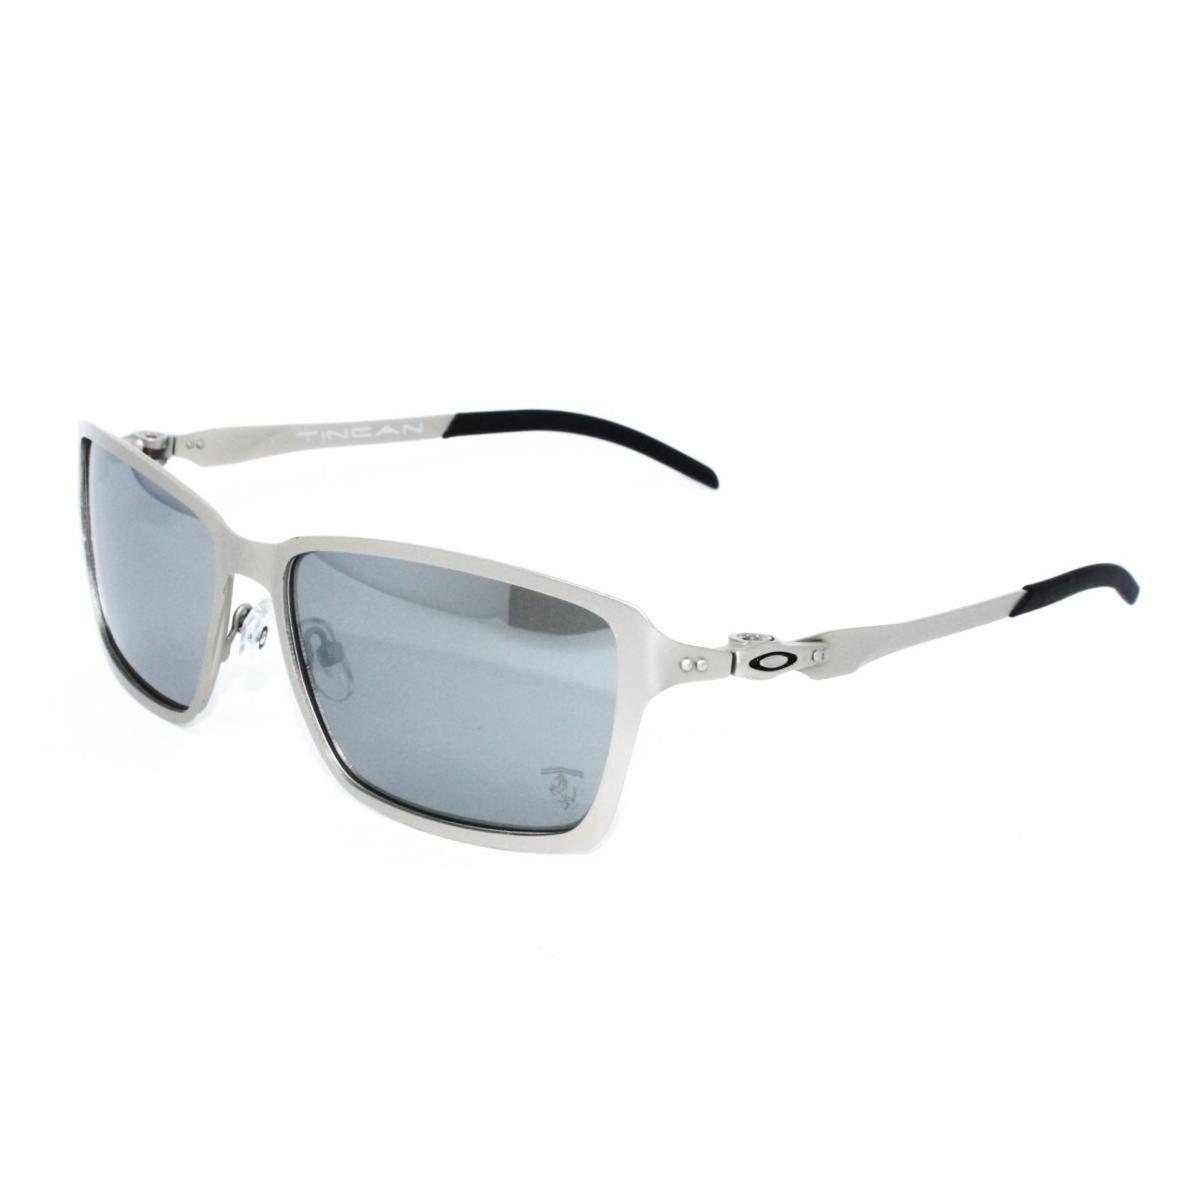 óculos oakley tincan ferrari 100% polarizado promoção!!! - óculos oakley 7020af1a2d